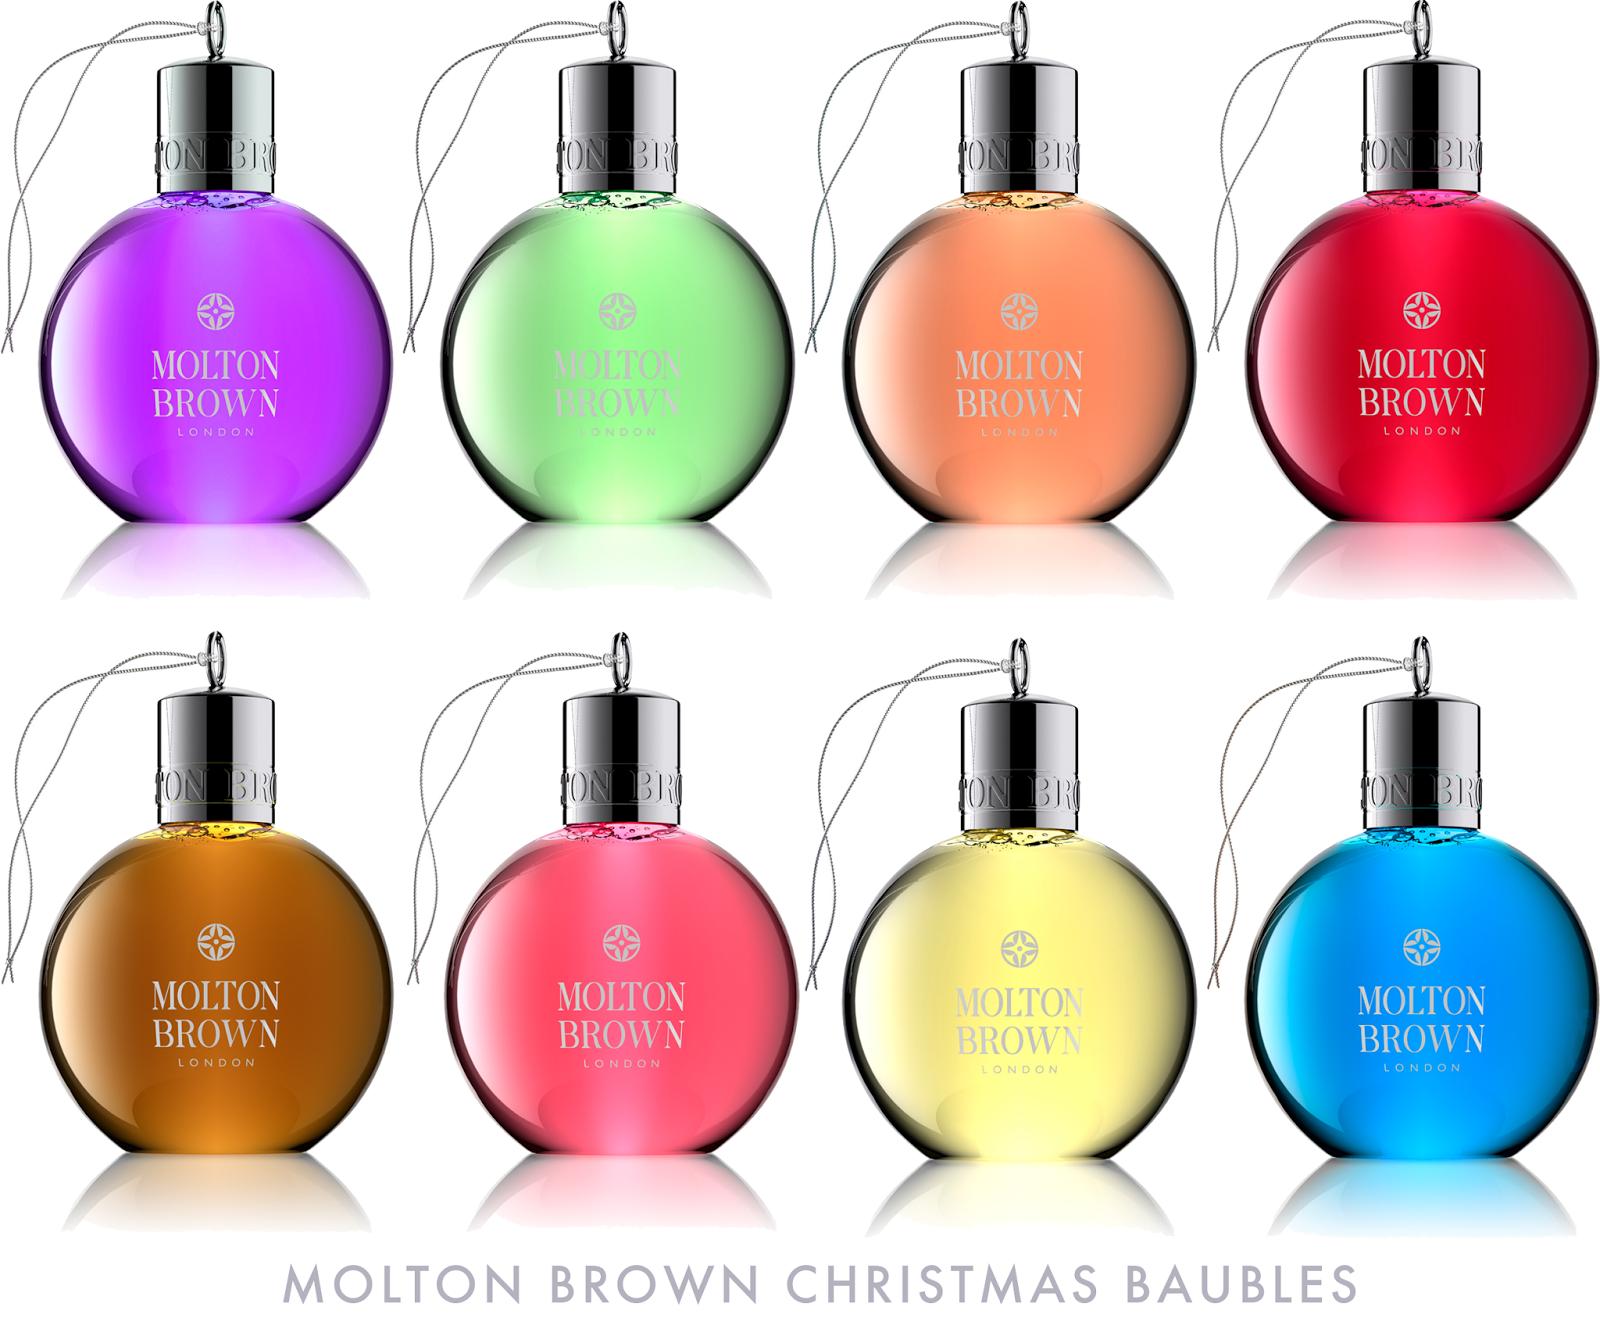 Molton brown christmas baubles, molton brown baubles | Alicia's ...